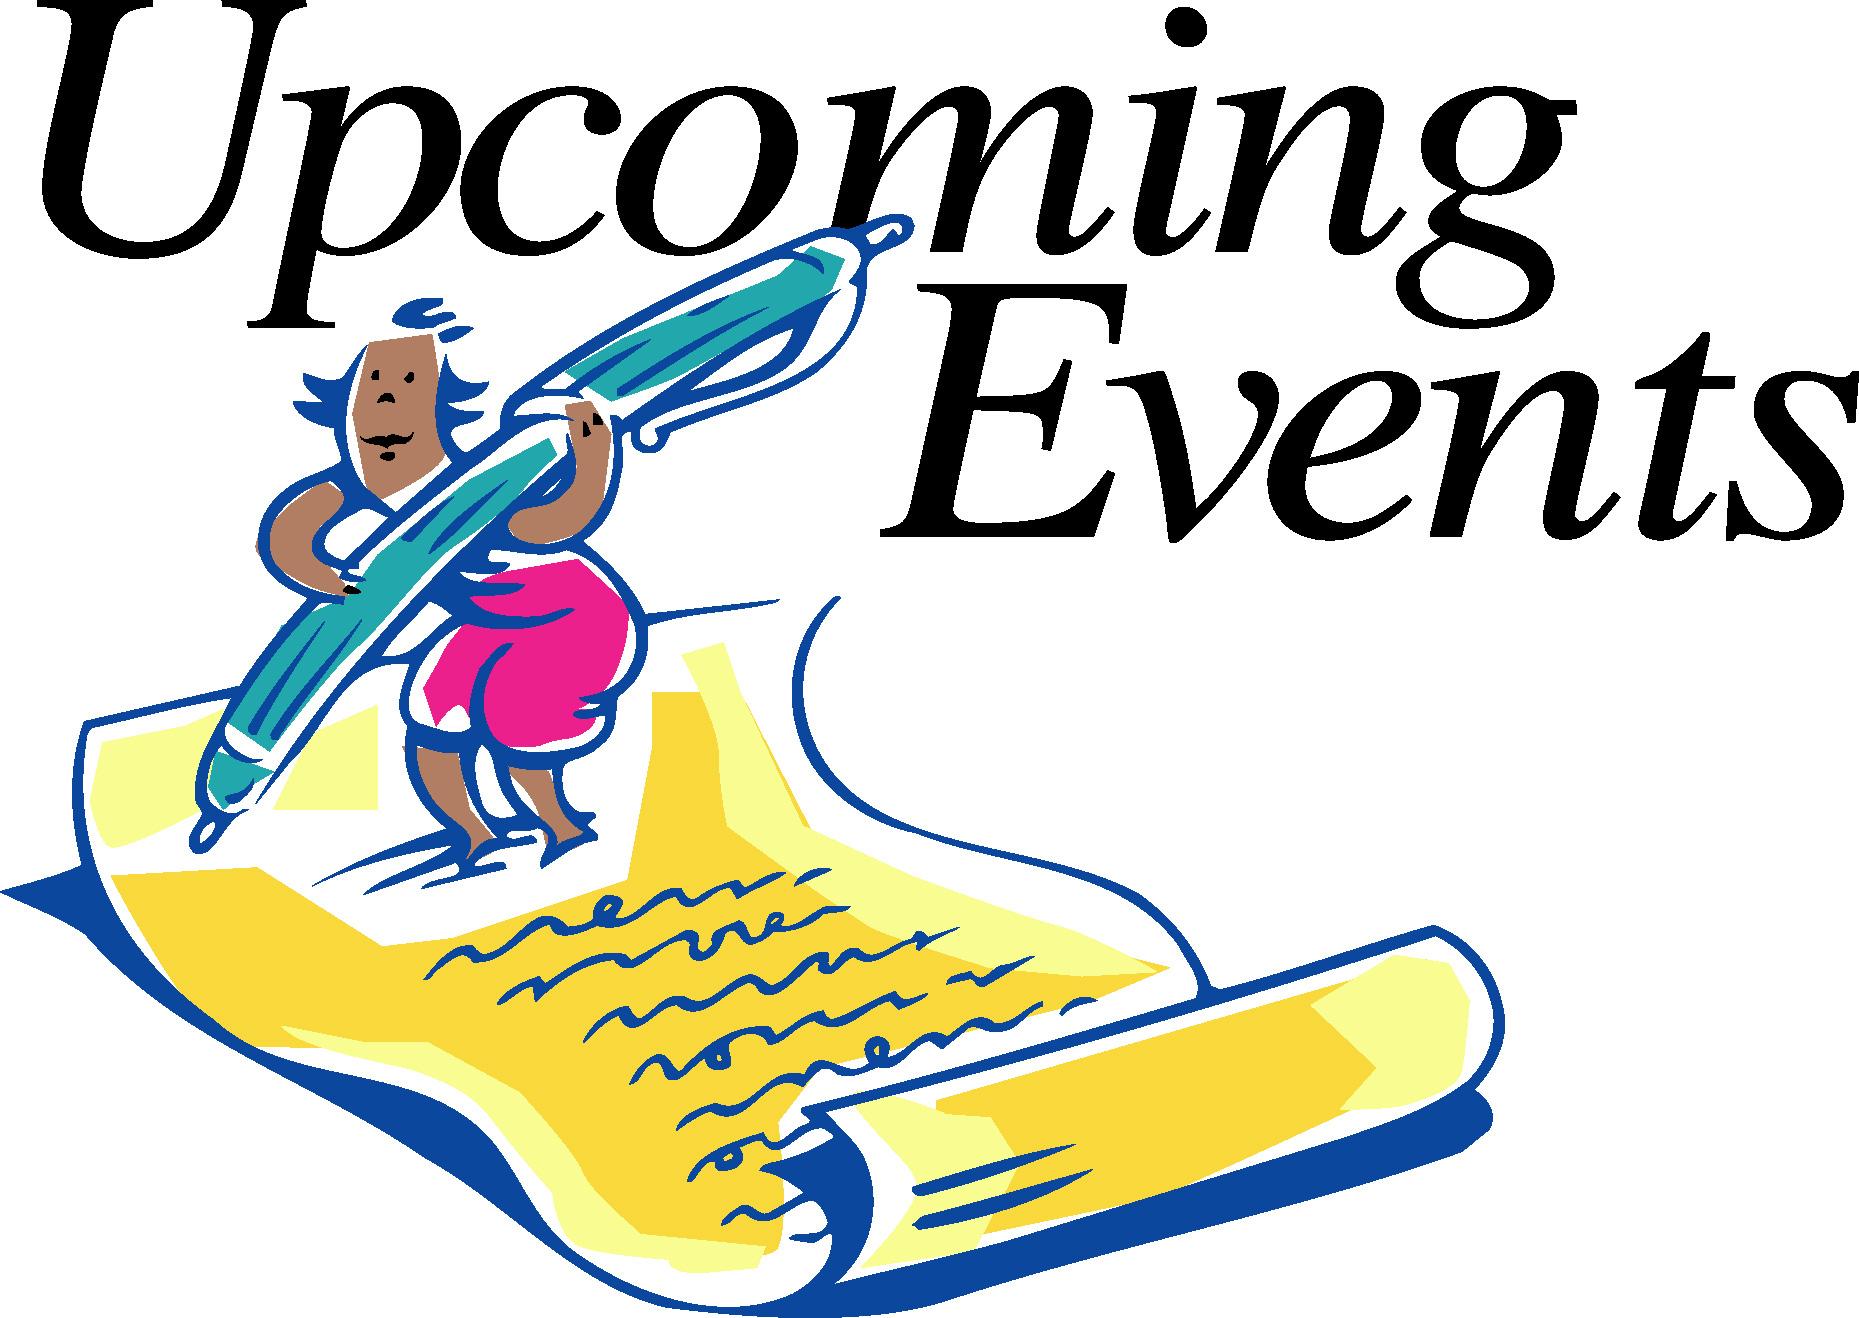 Calendar Upcoming Events Clipart - Clipart Kid